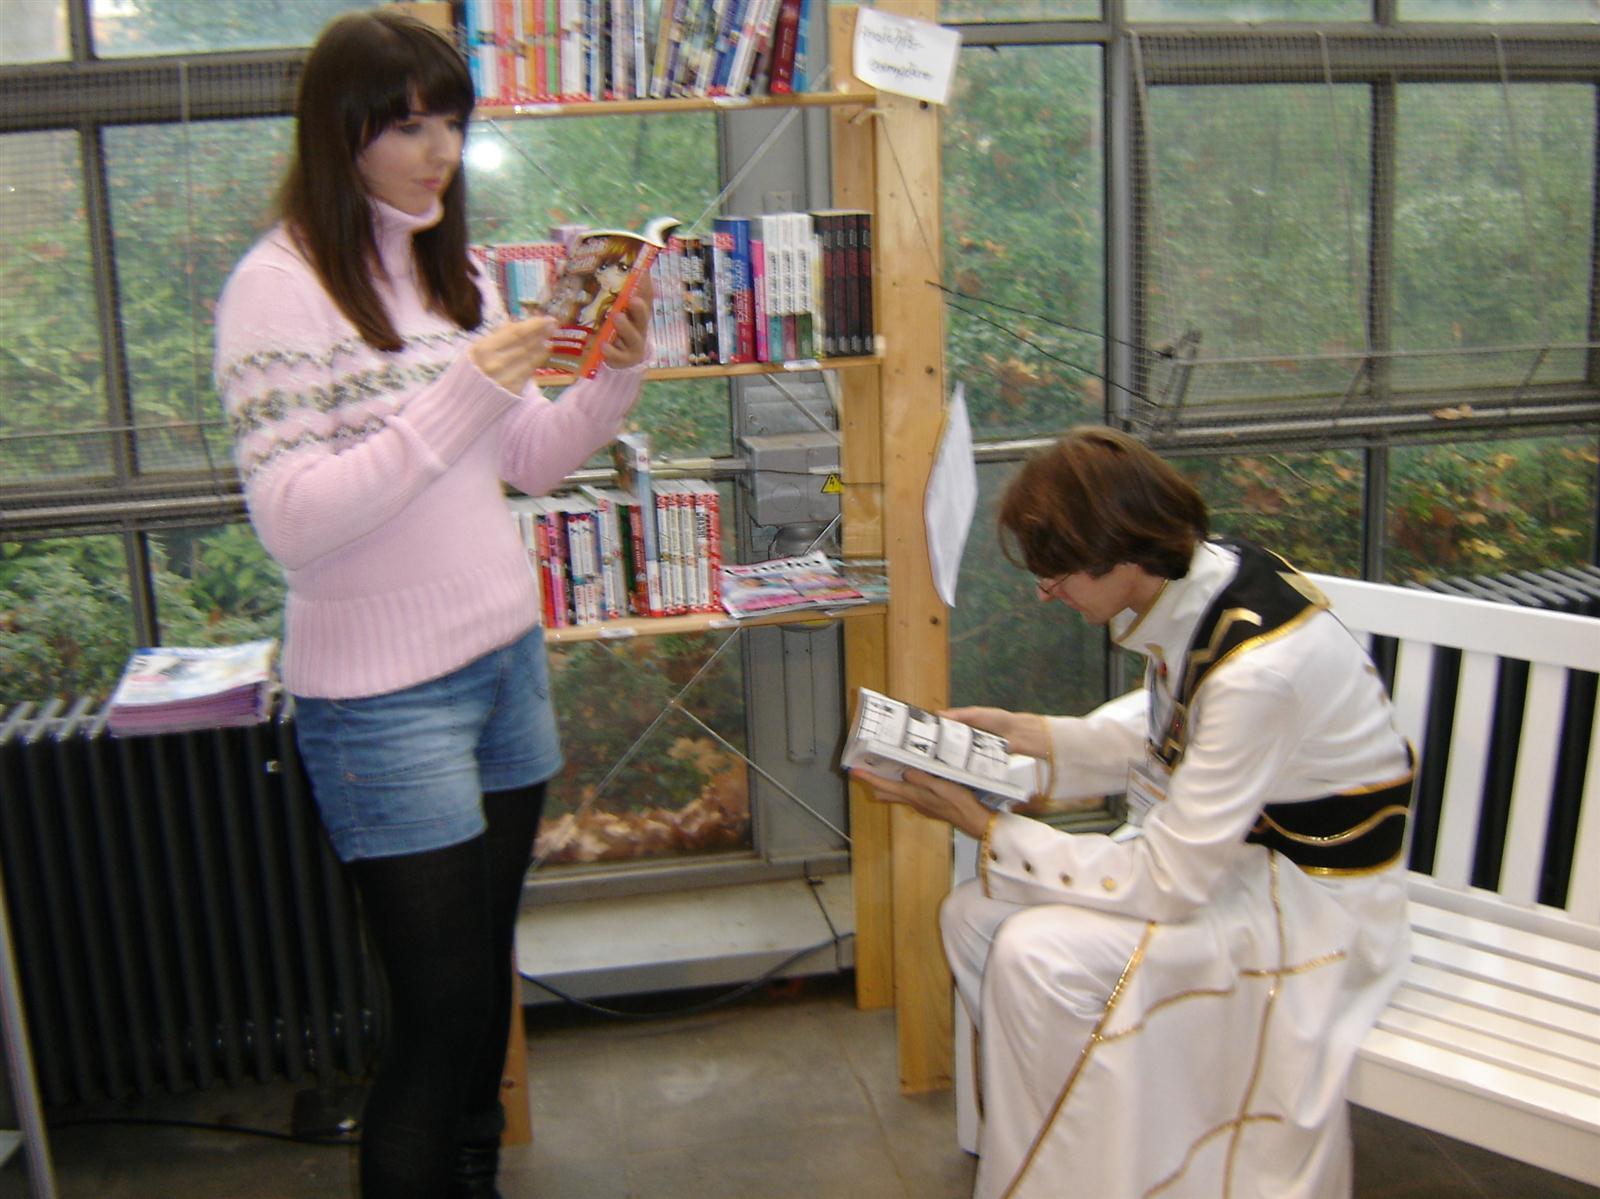 Japan_Week_2011_Wie.MAI.KAI_Leseecke_Palmengarten_wmk_019